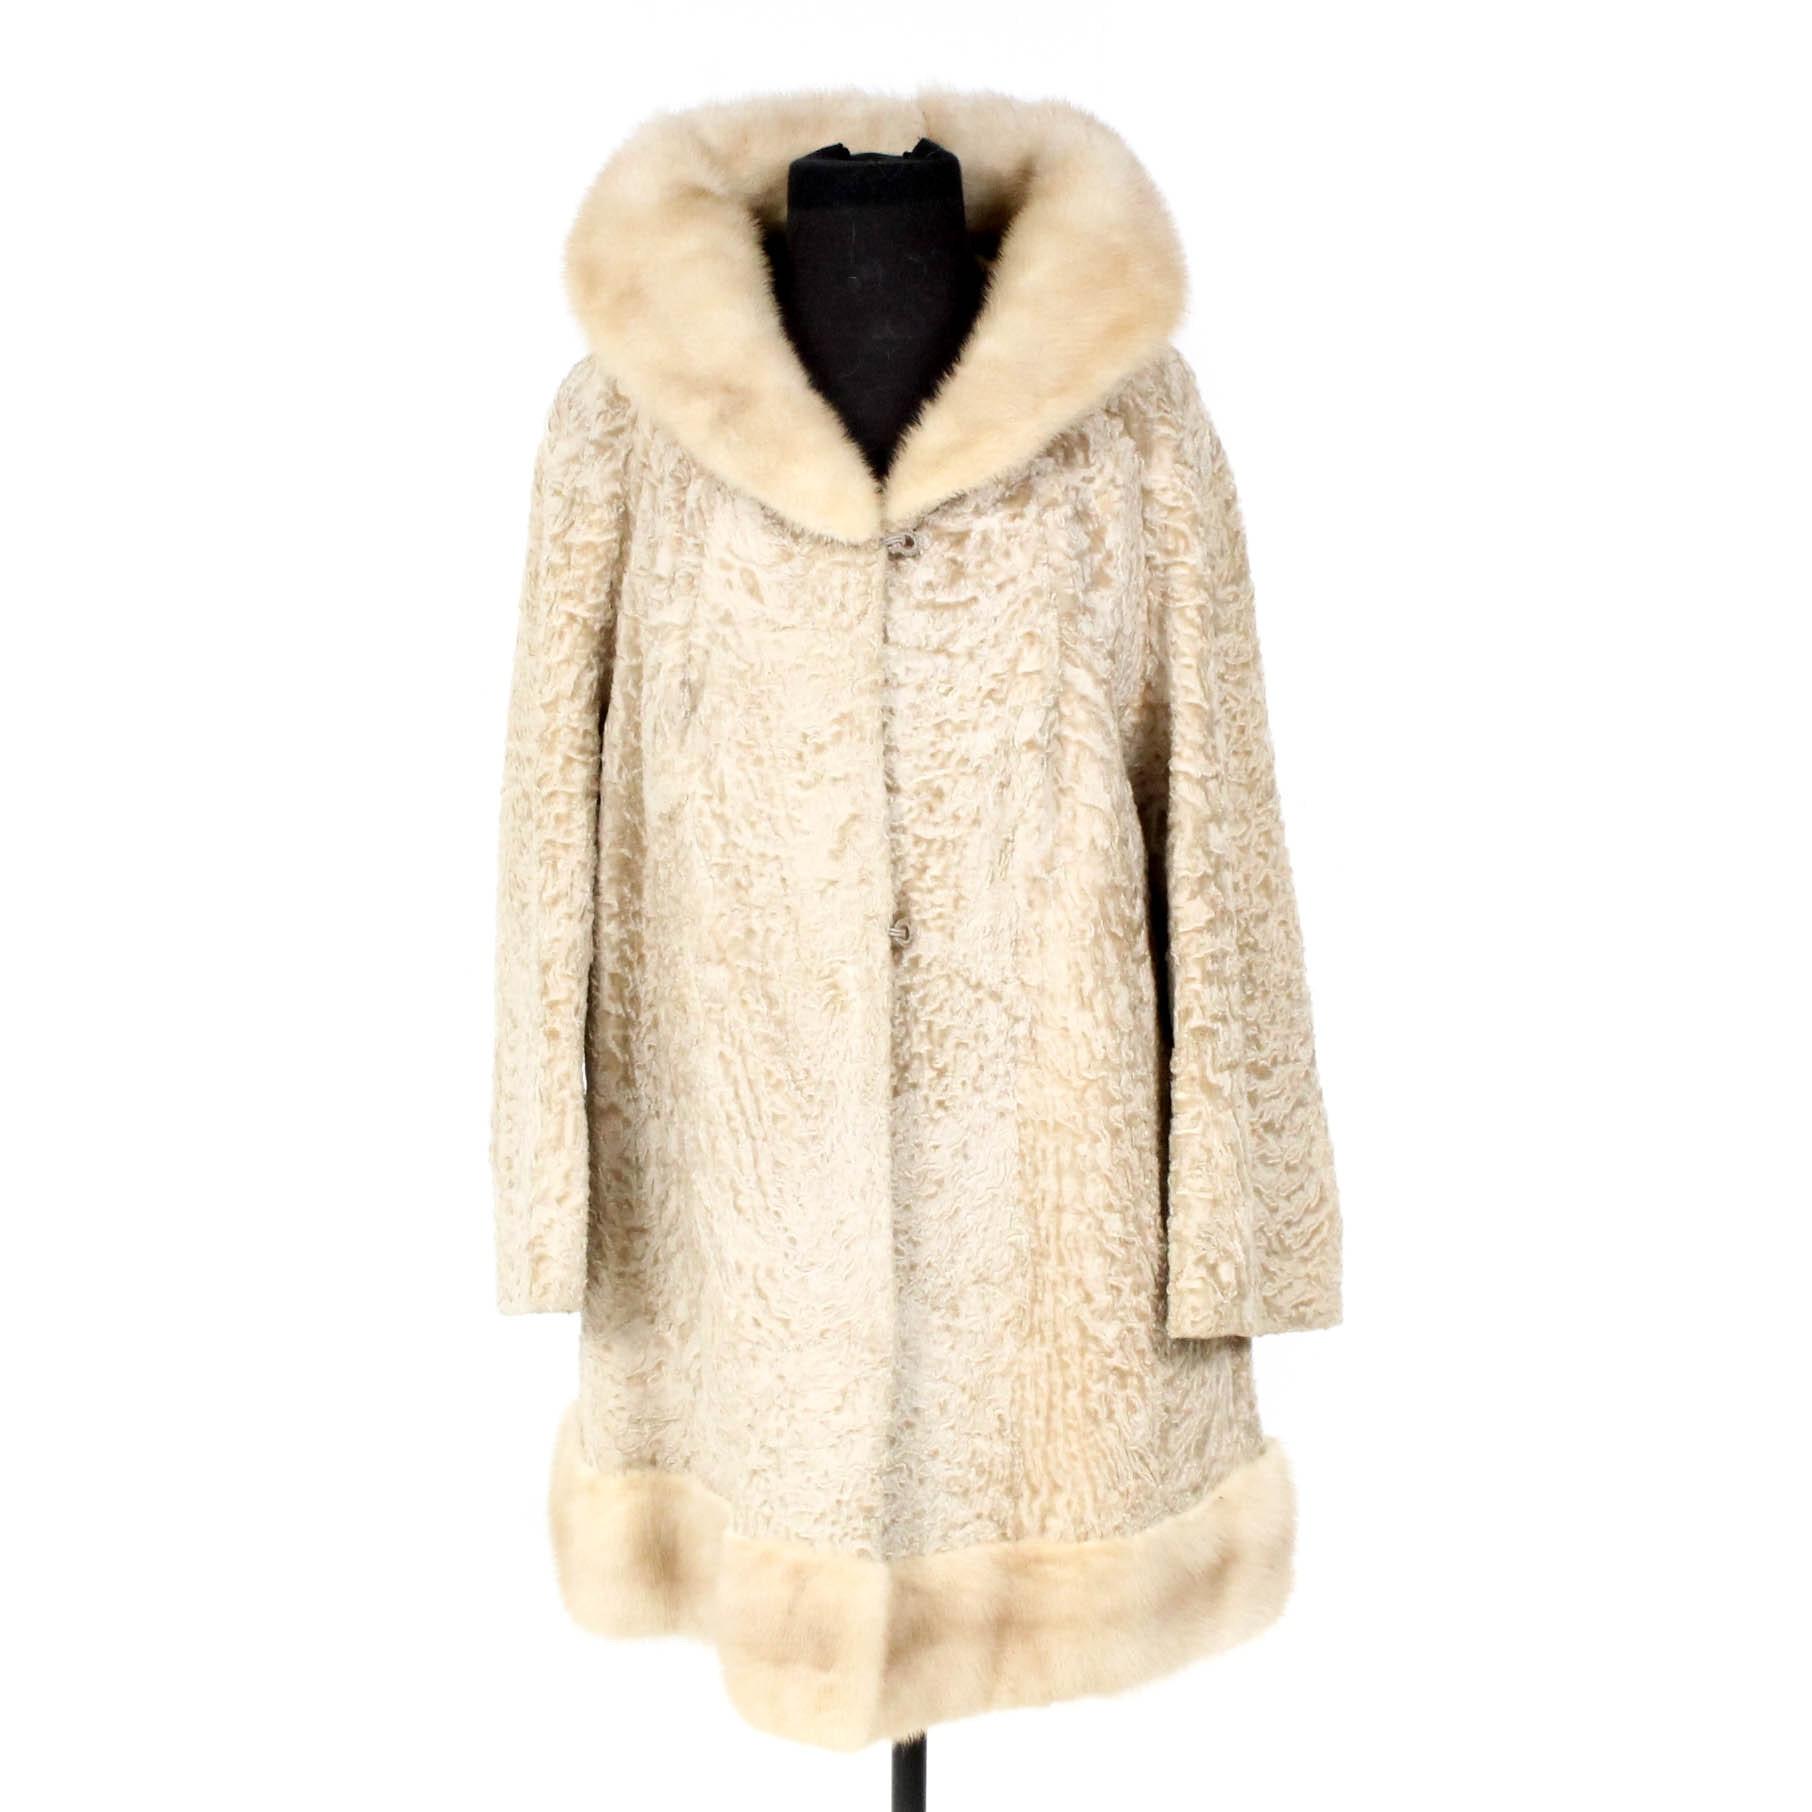 Blond Persian Lamb Coat with Mink Fur Collar